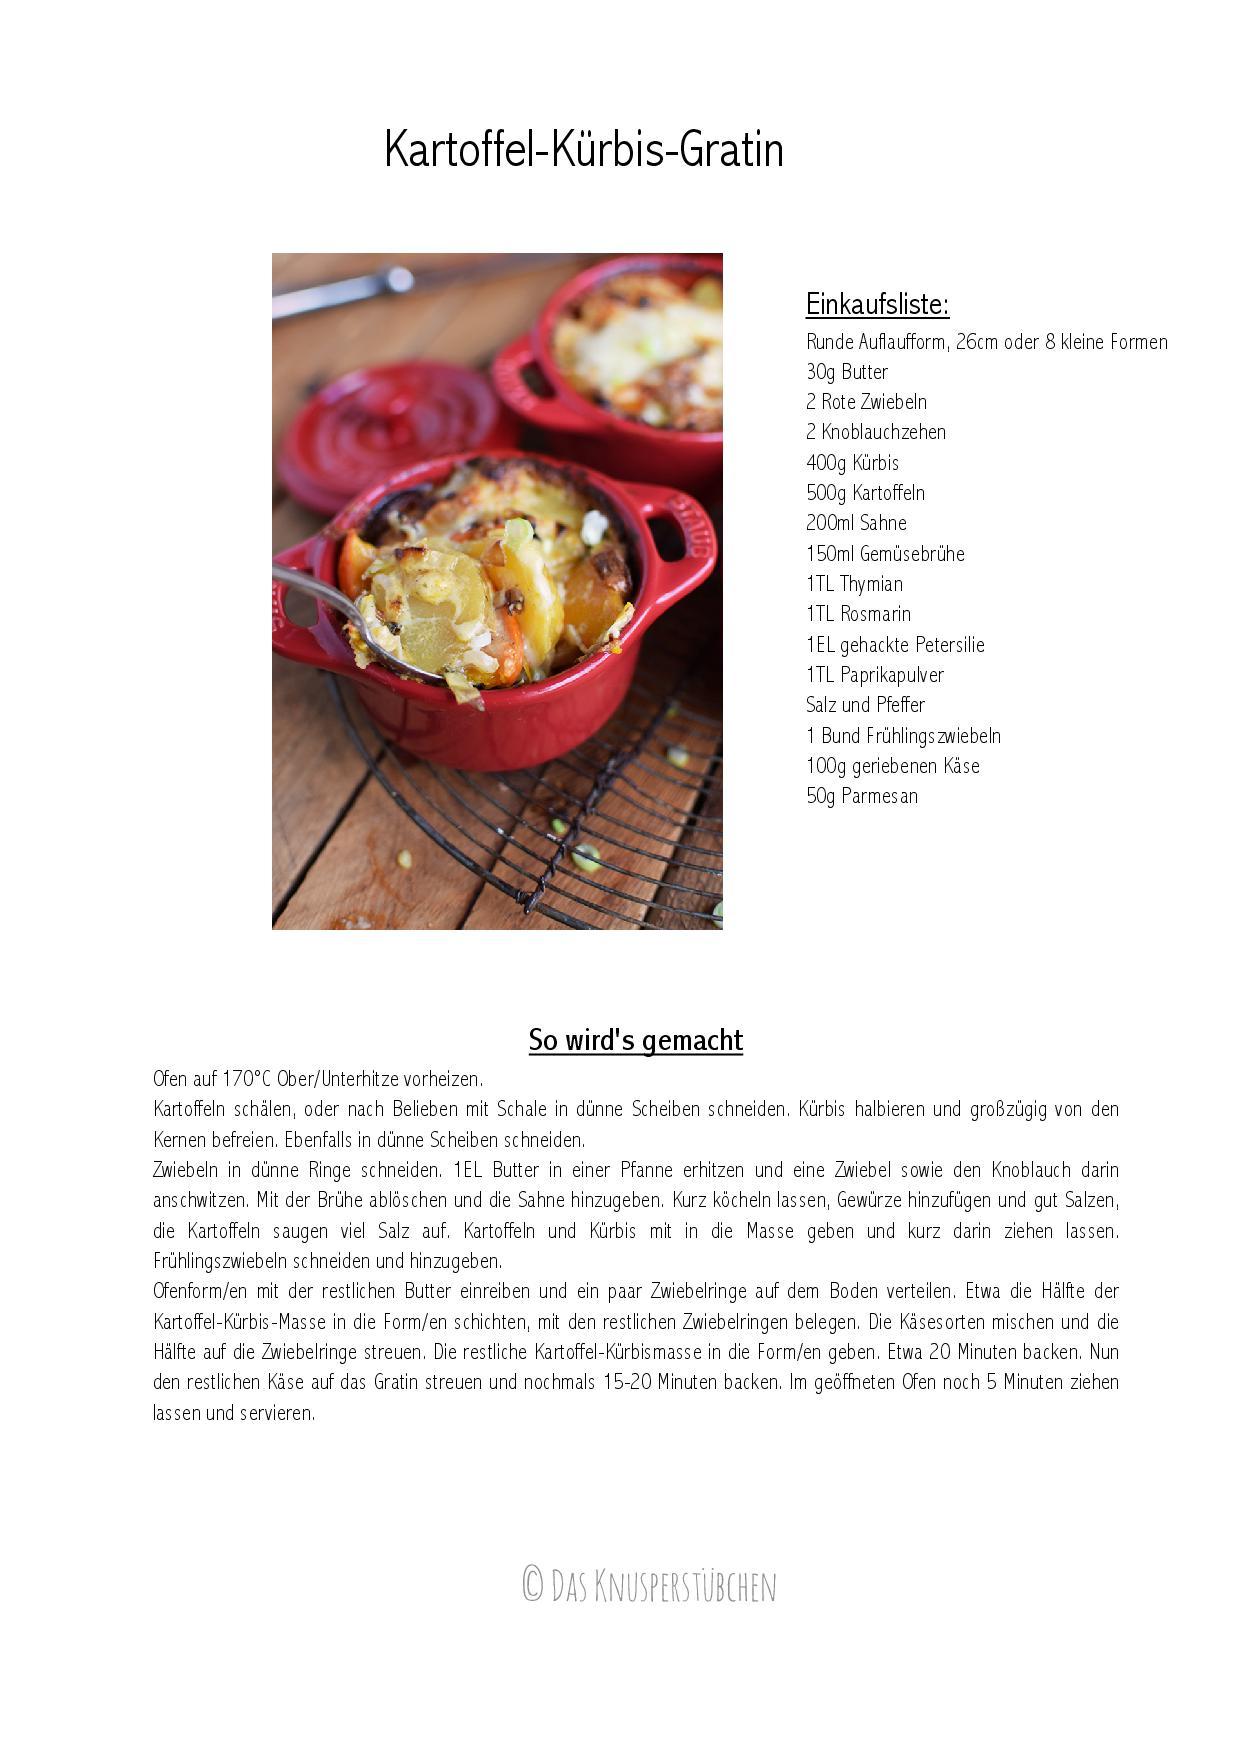 kartoffel-kuerbis-gratin-potato-pumpkin-gratin-001